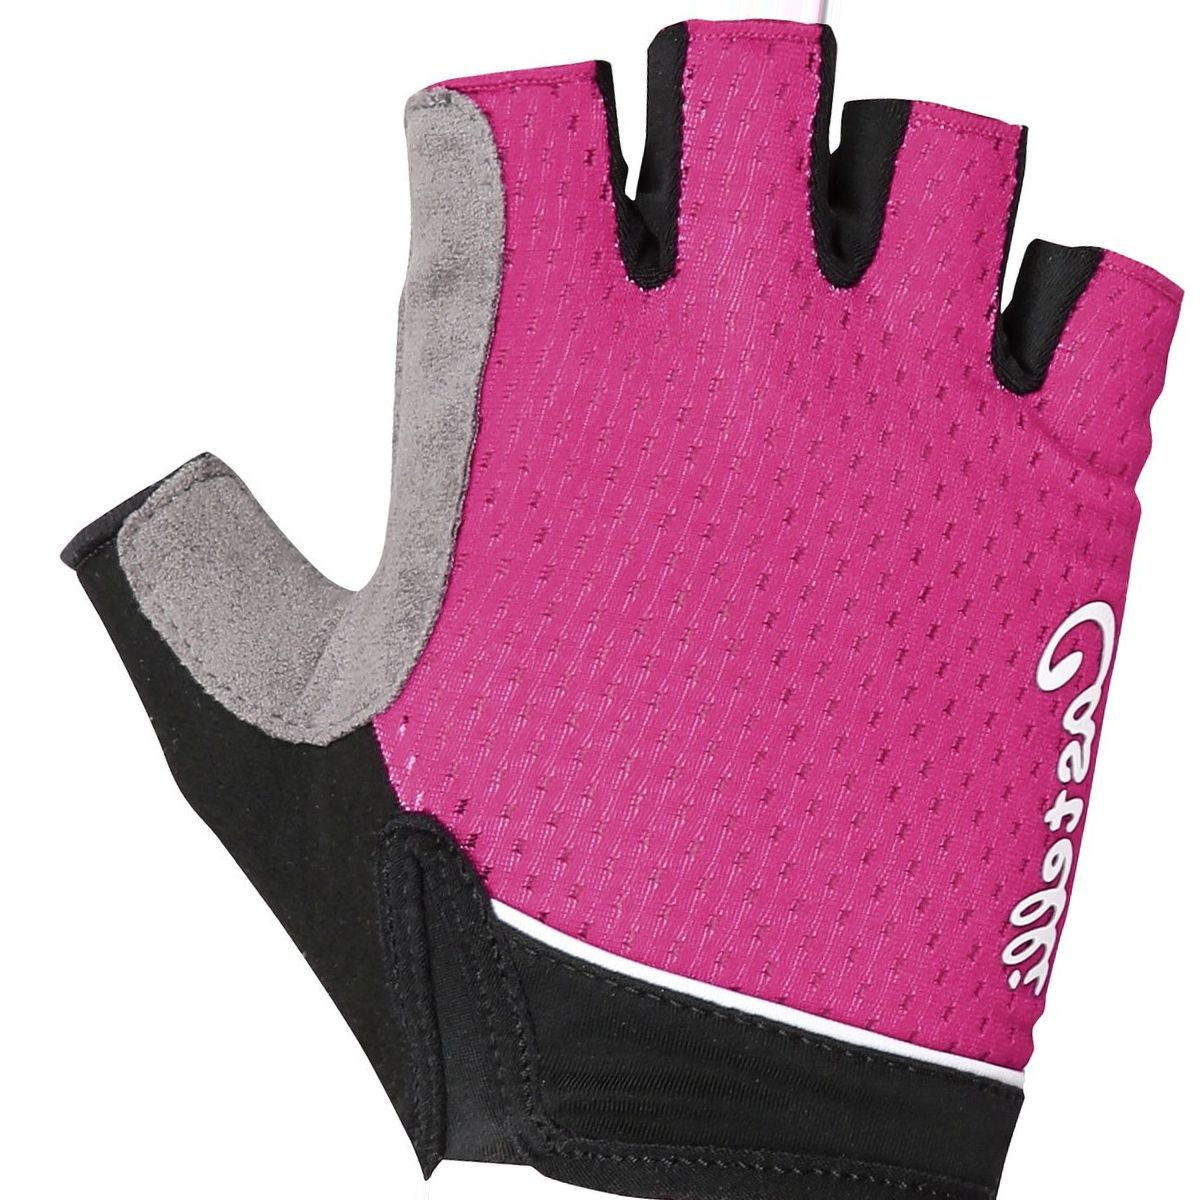 Castelli Roubaix Gel Glove - Women's